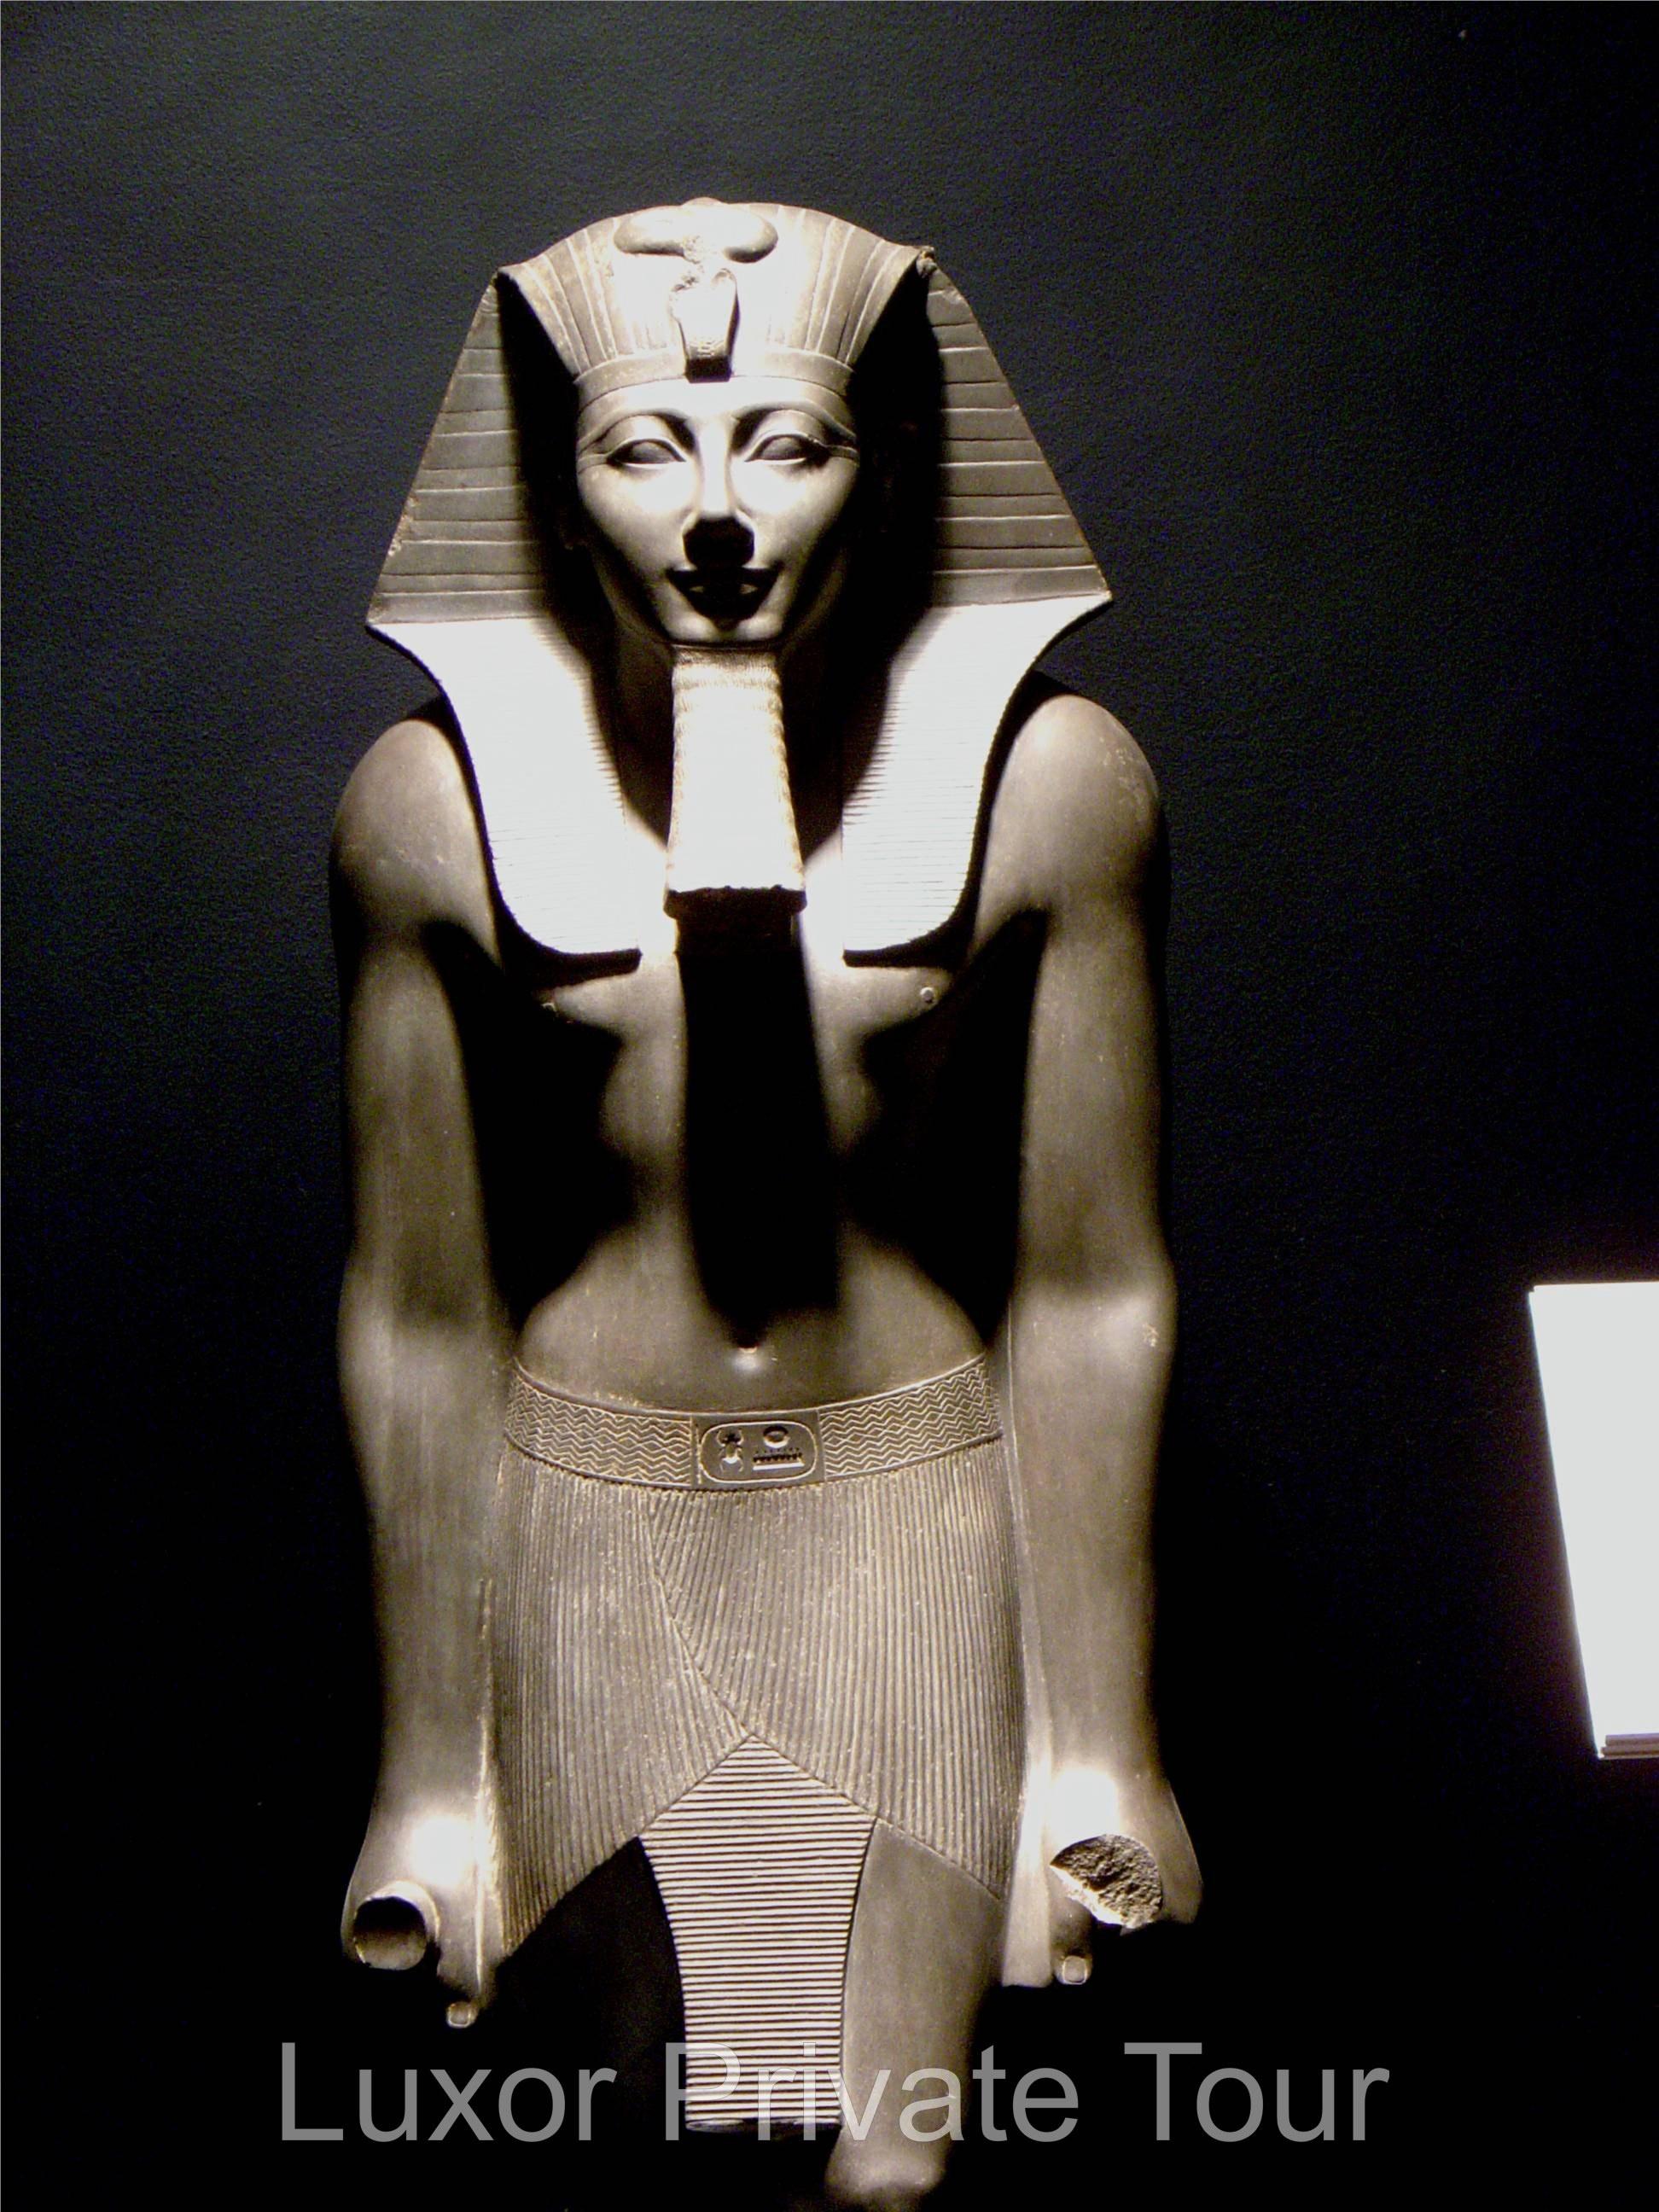 Luxor City Break Tour(3 Days)